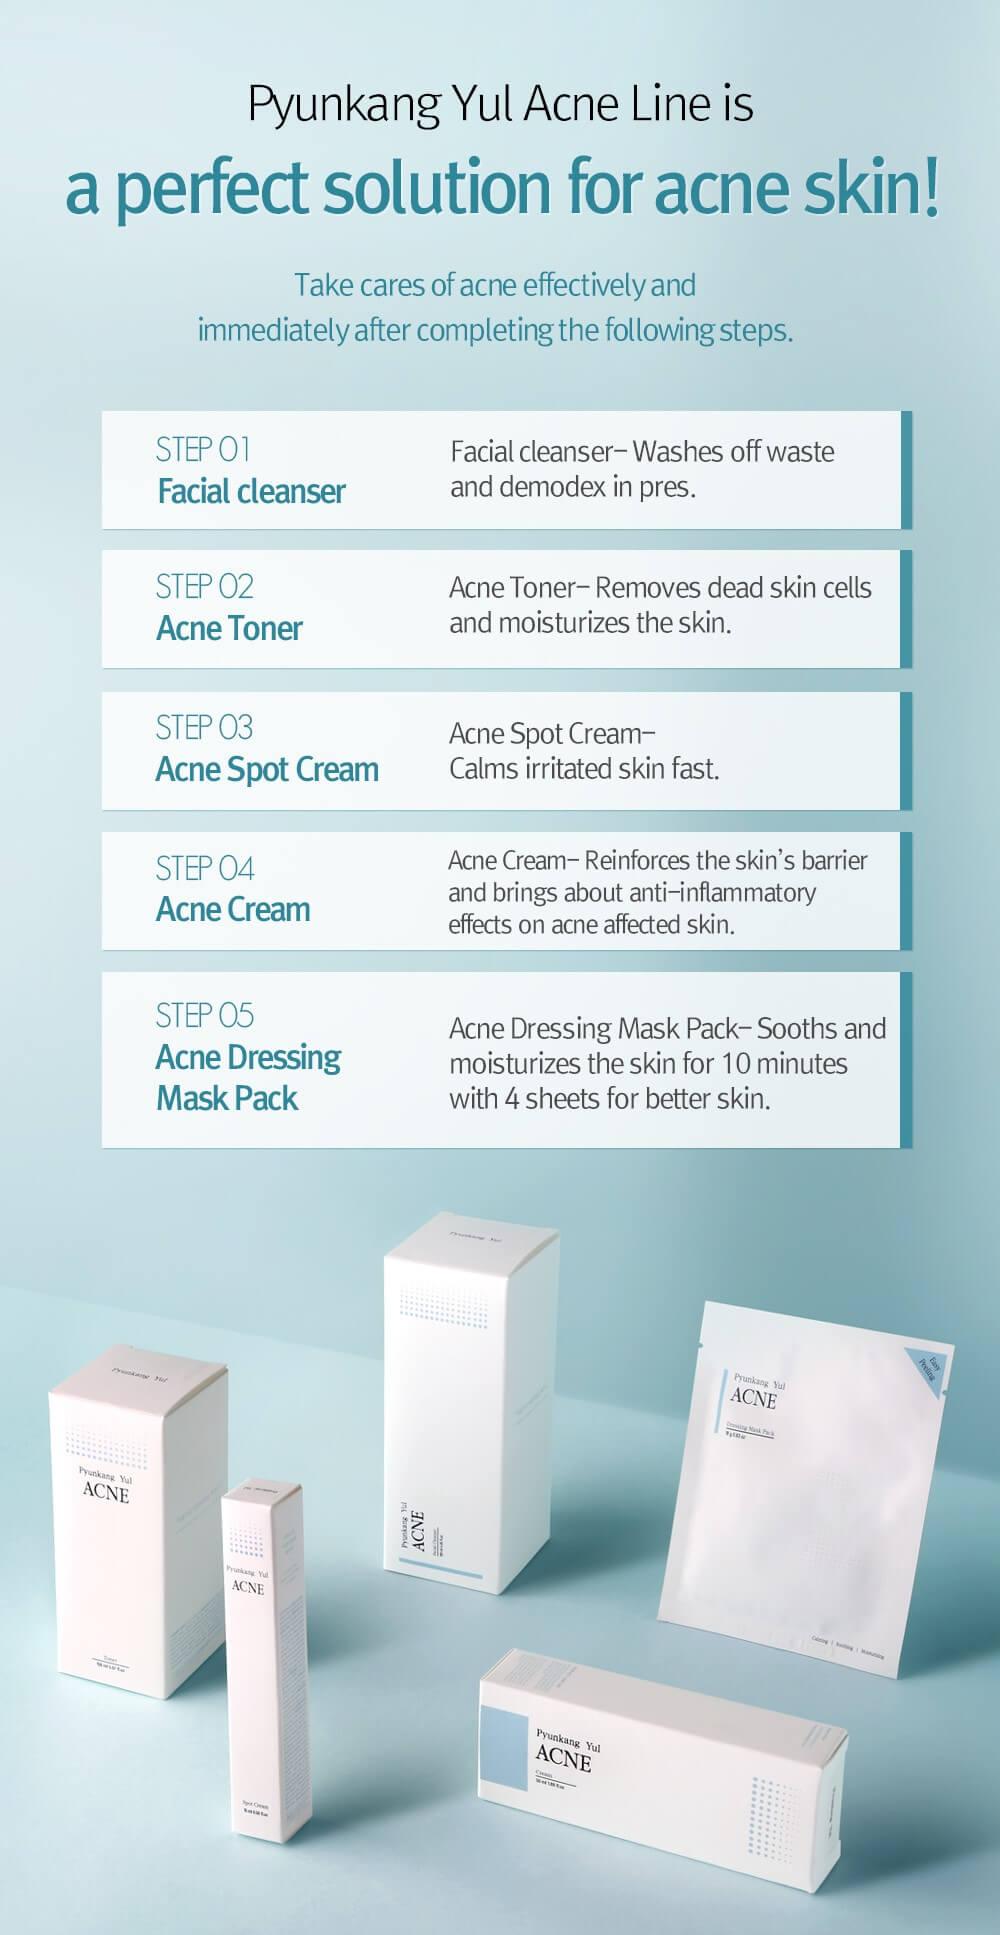 pyunkang-yul-acne-line.jpg